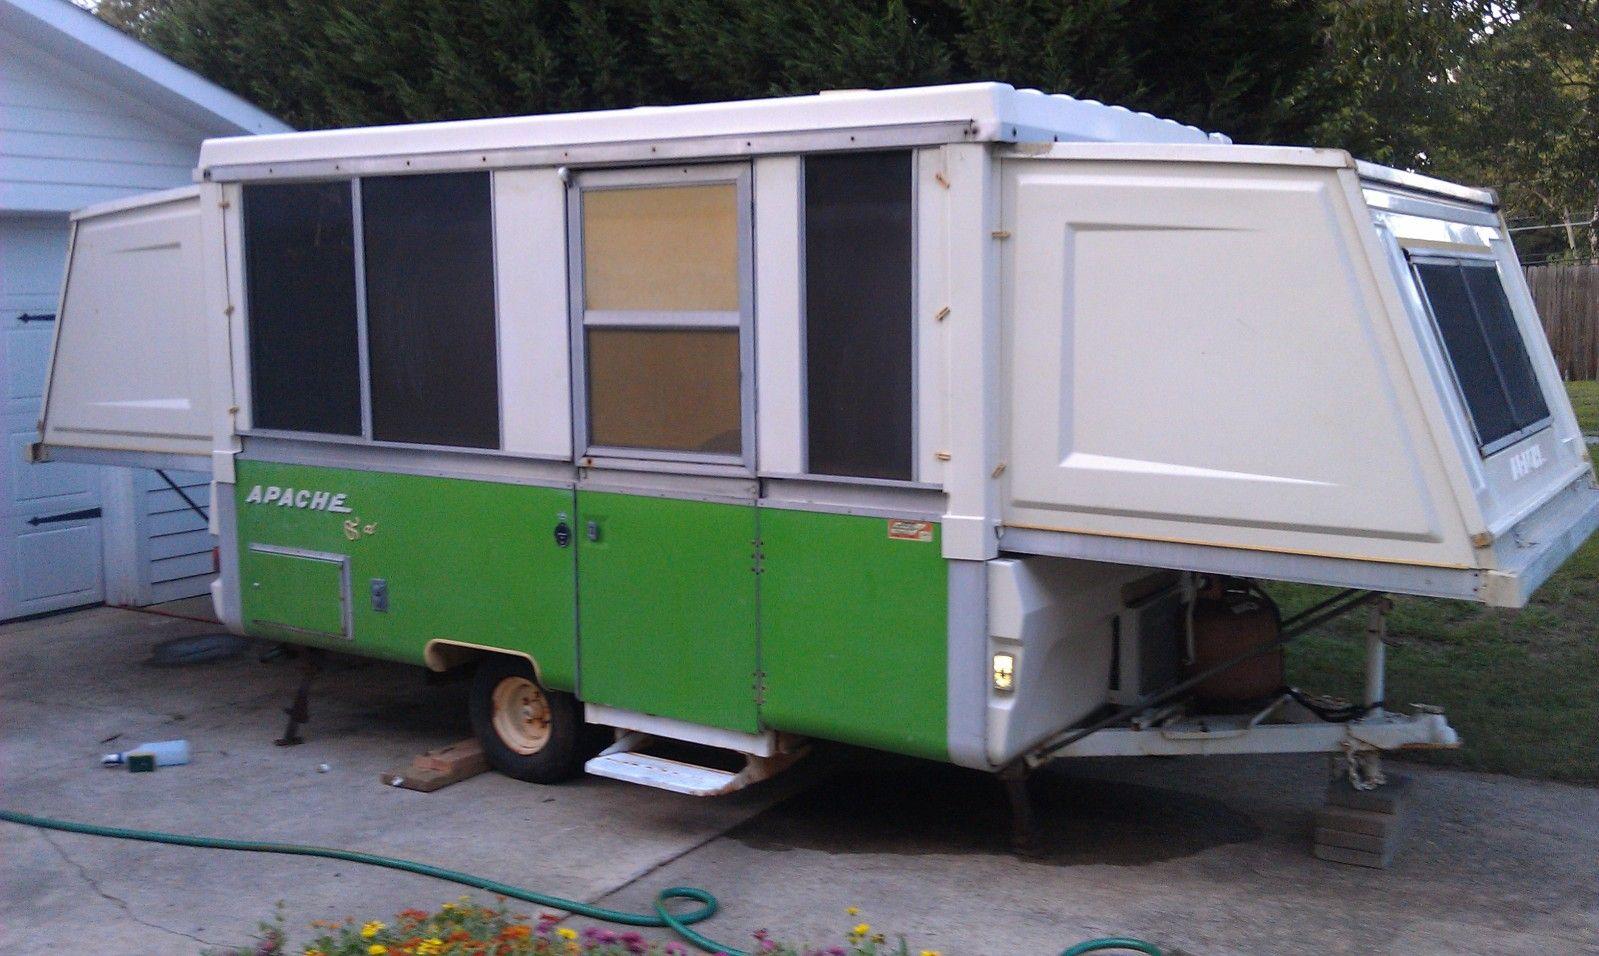 77 Apache Royal Apache Camper Tent Trailer Remodel Apache